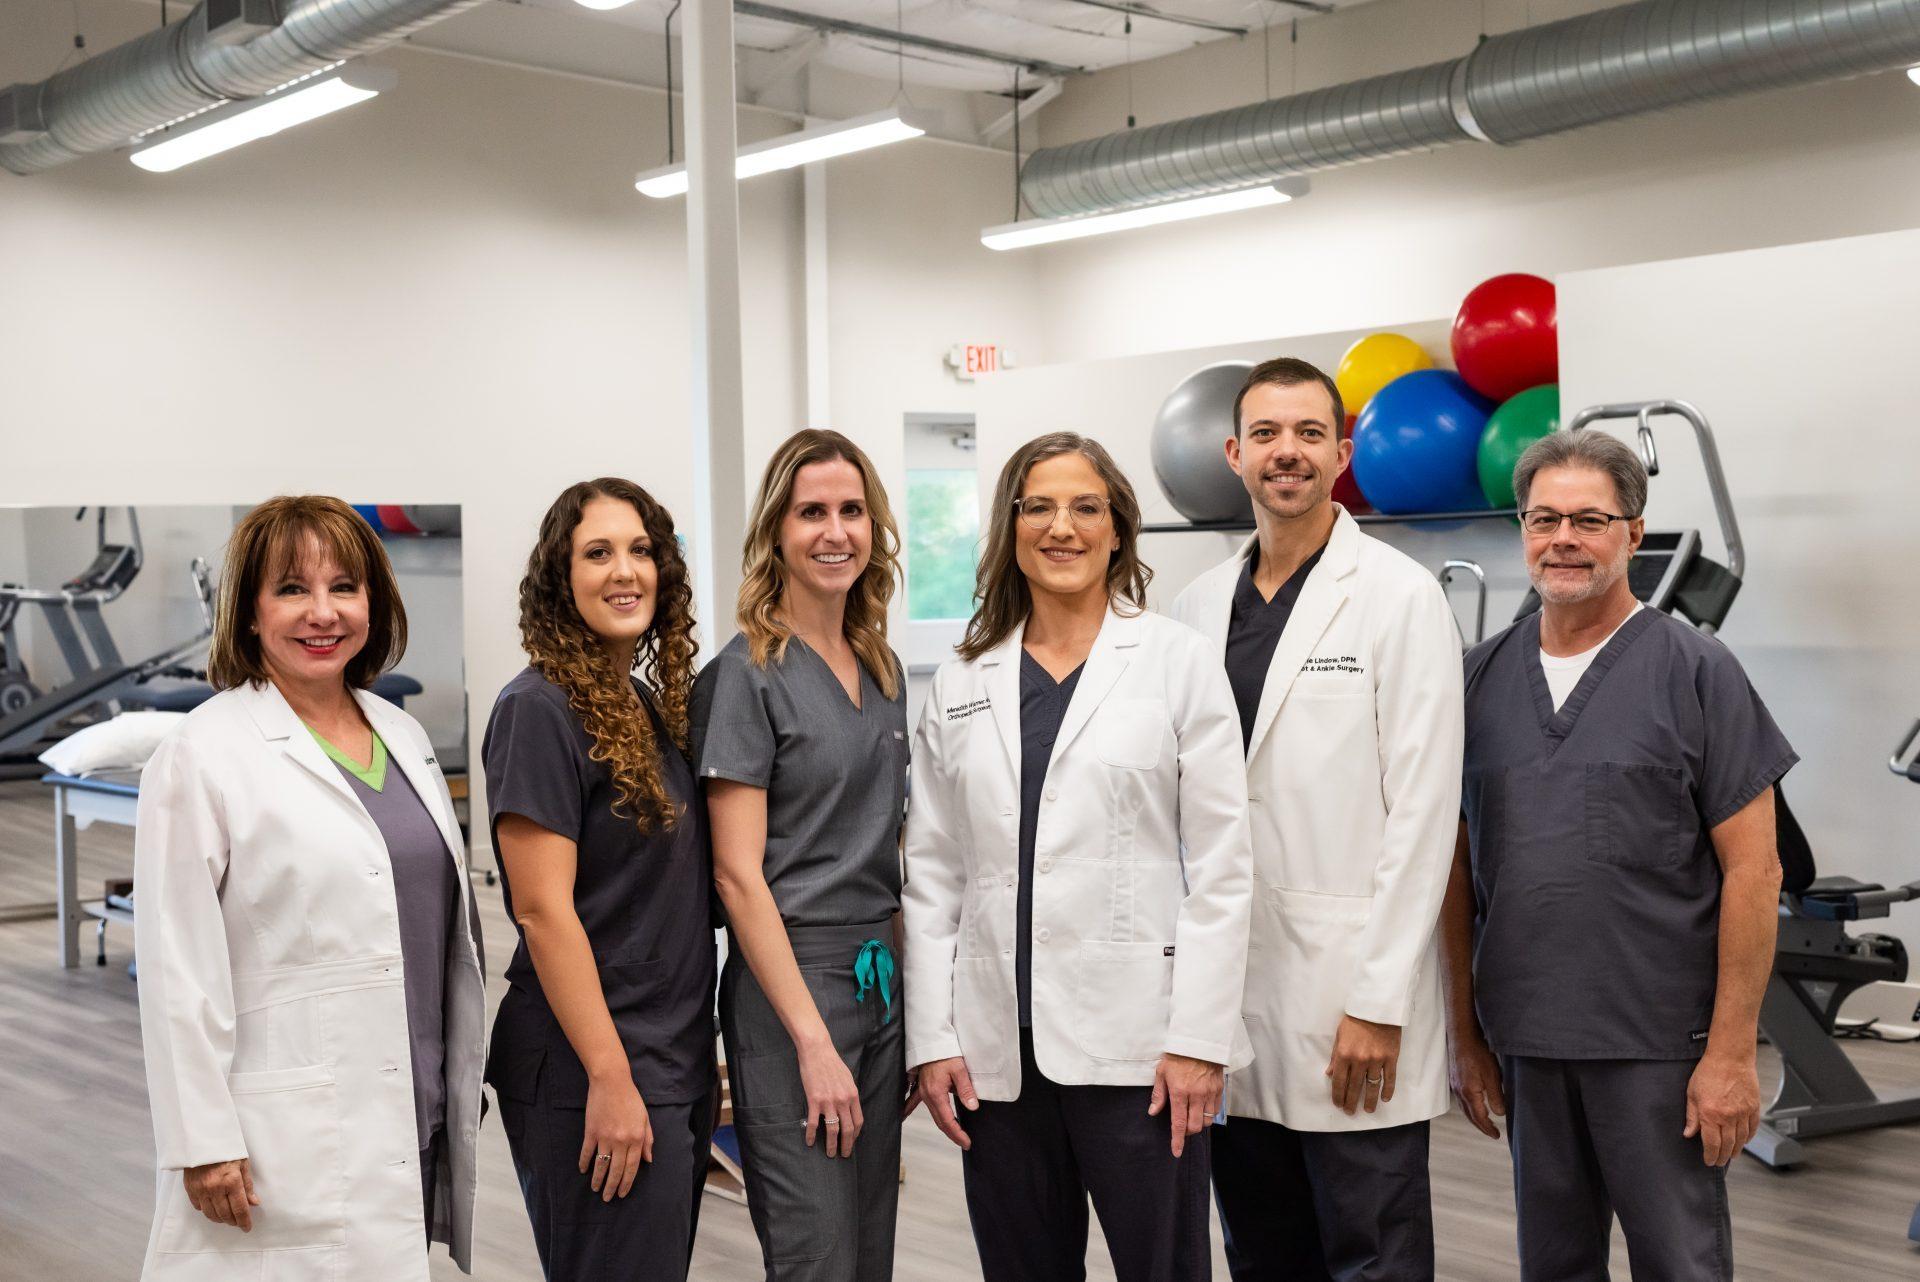 warner orthopedics group